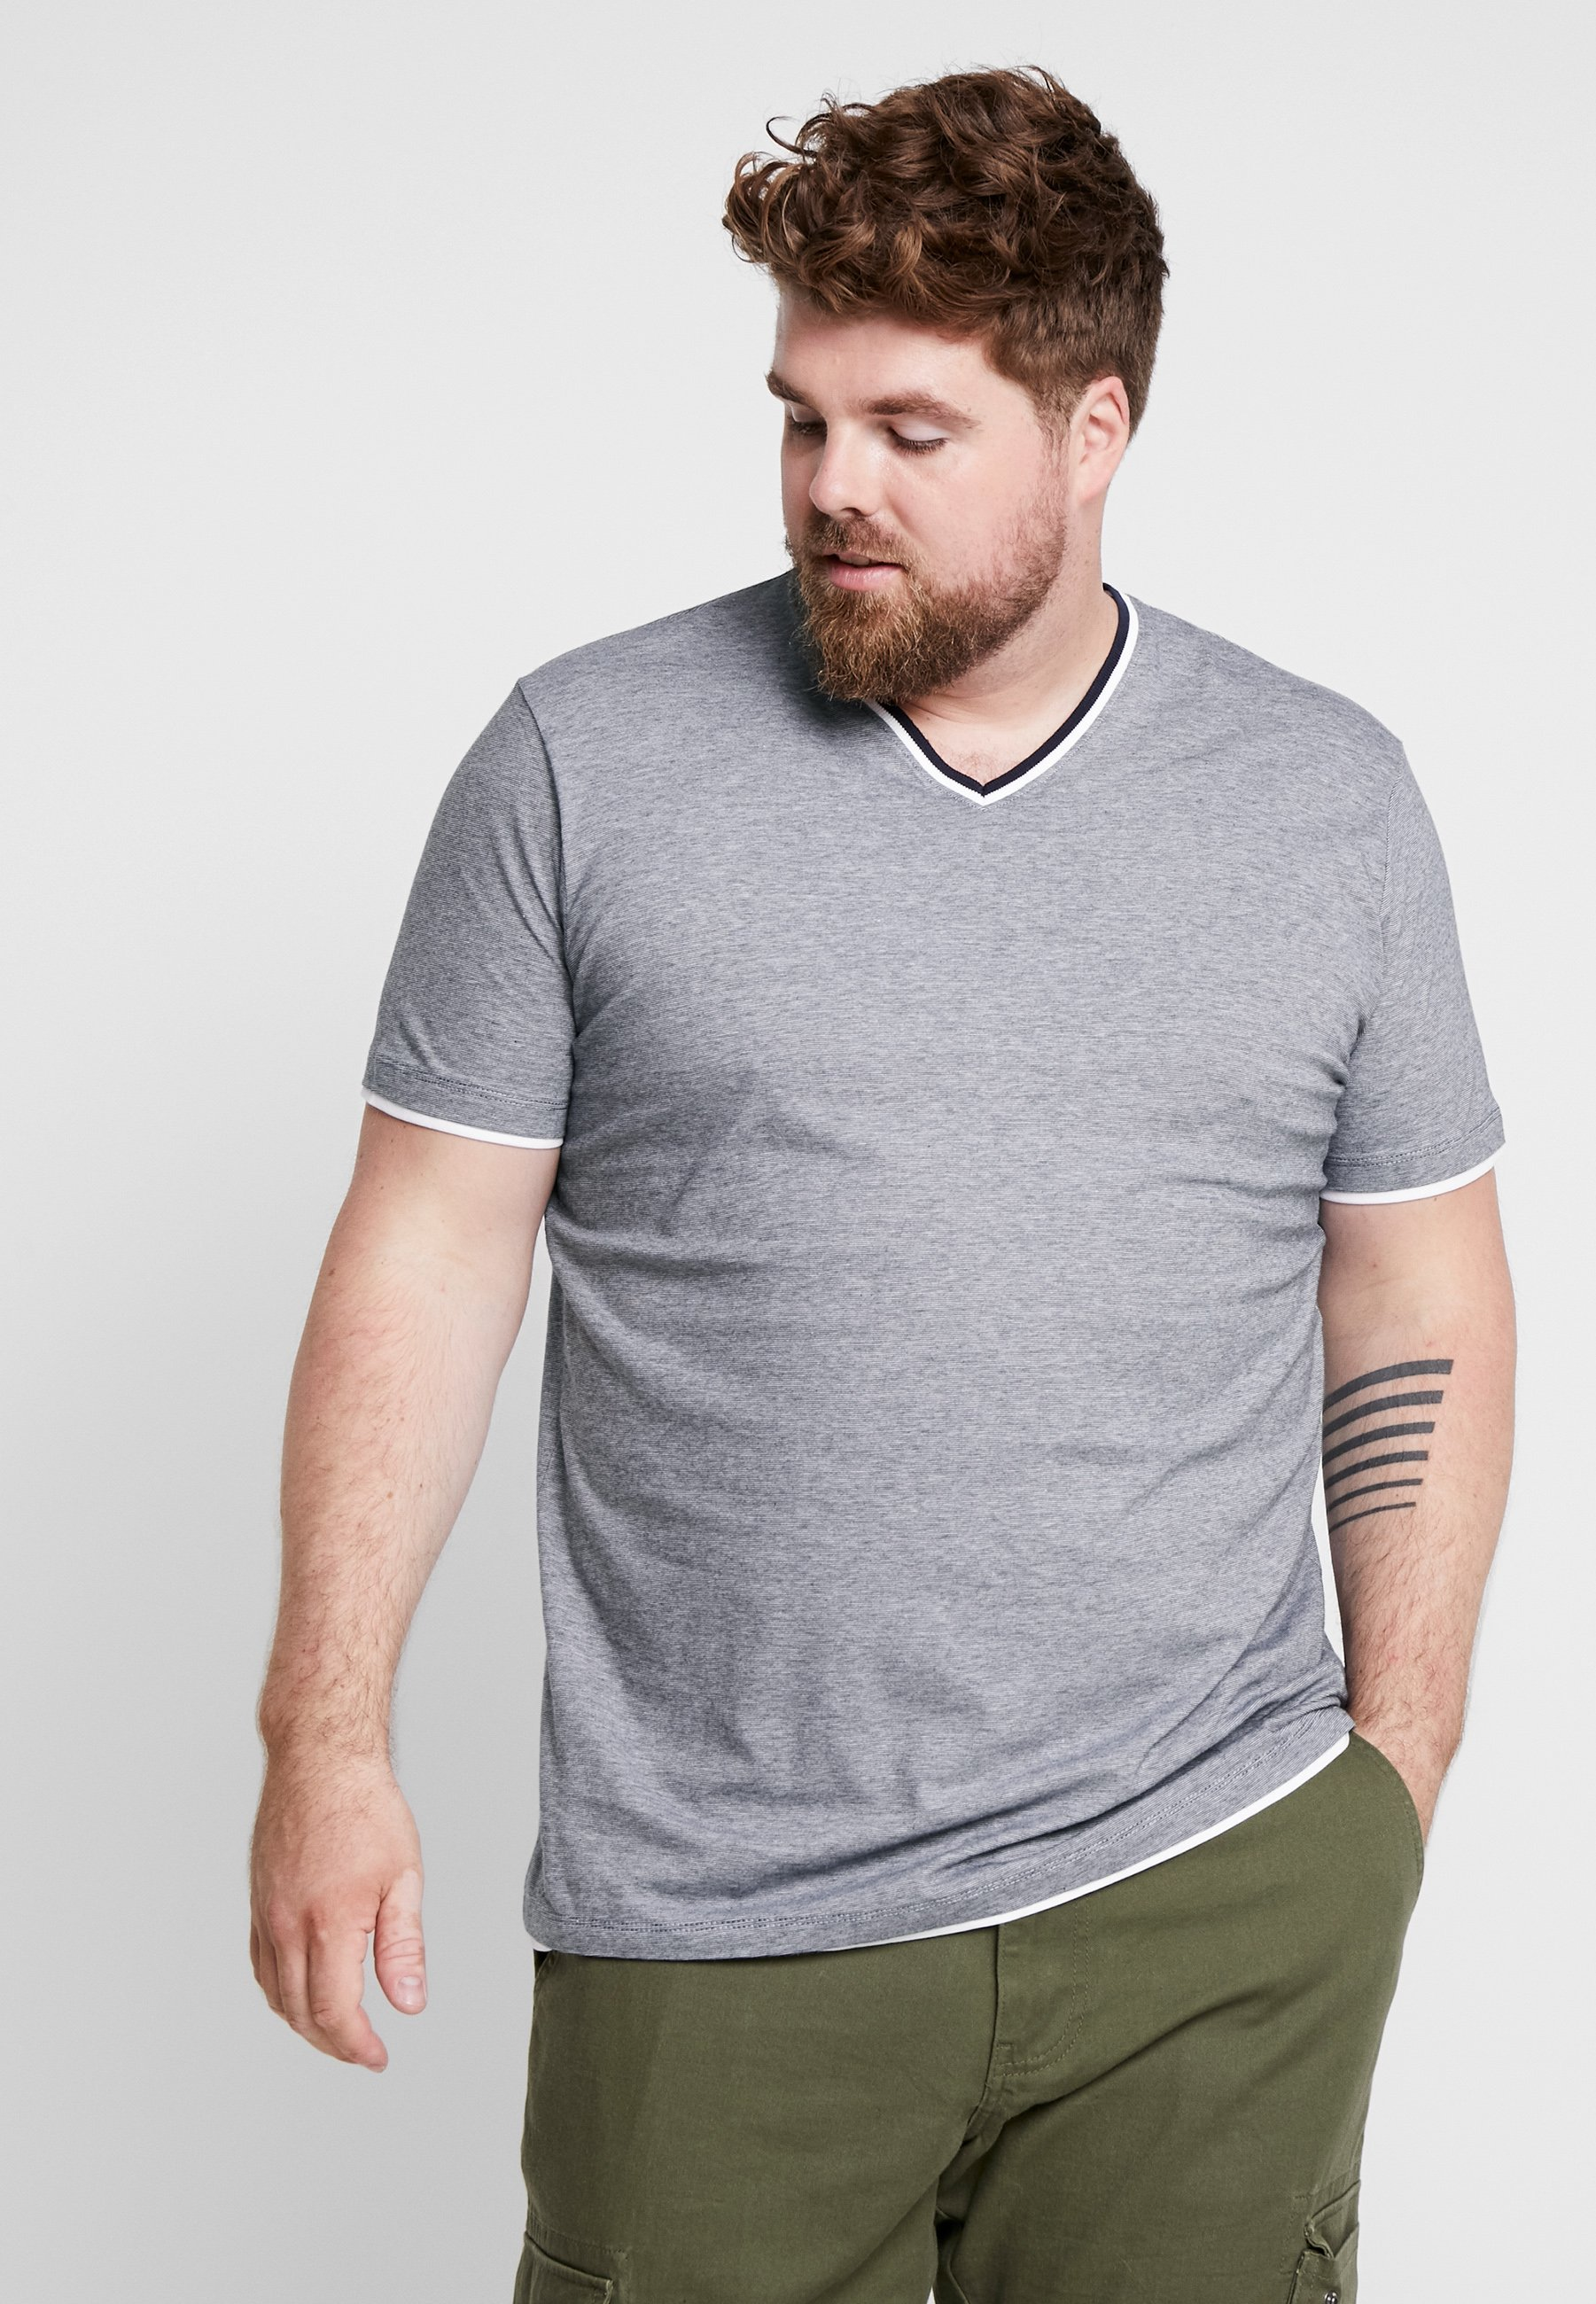 shirt Imprimé Esprit shirt Esprit shirt Navy BigT BigT Imprimé Navy Esprit BigT VMUzSp